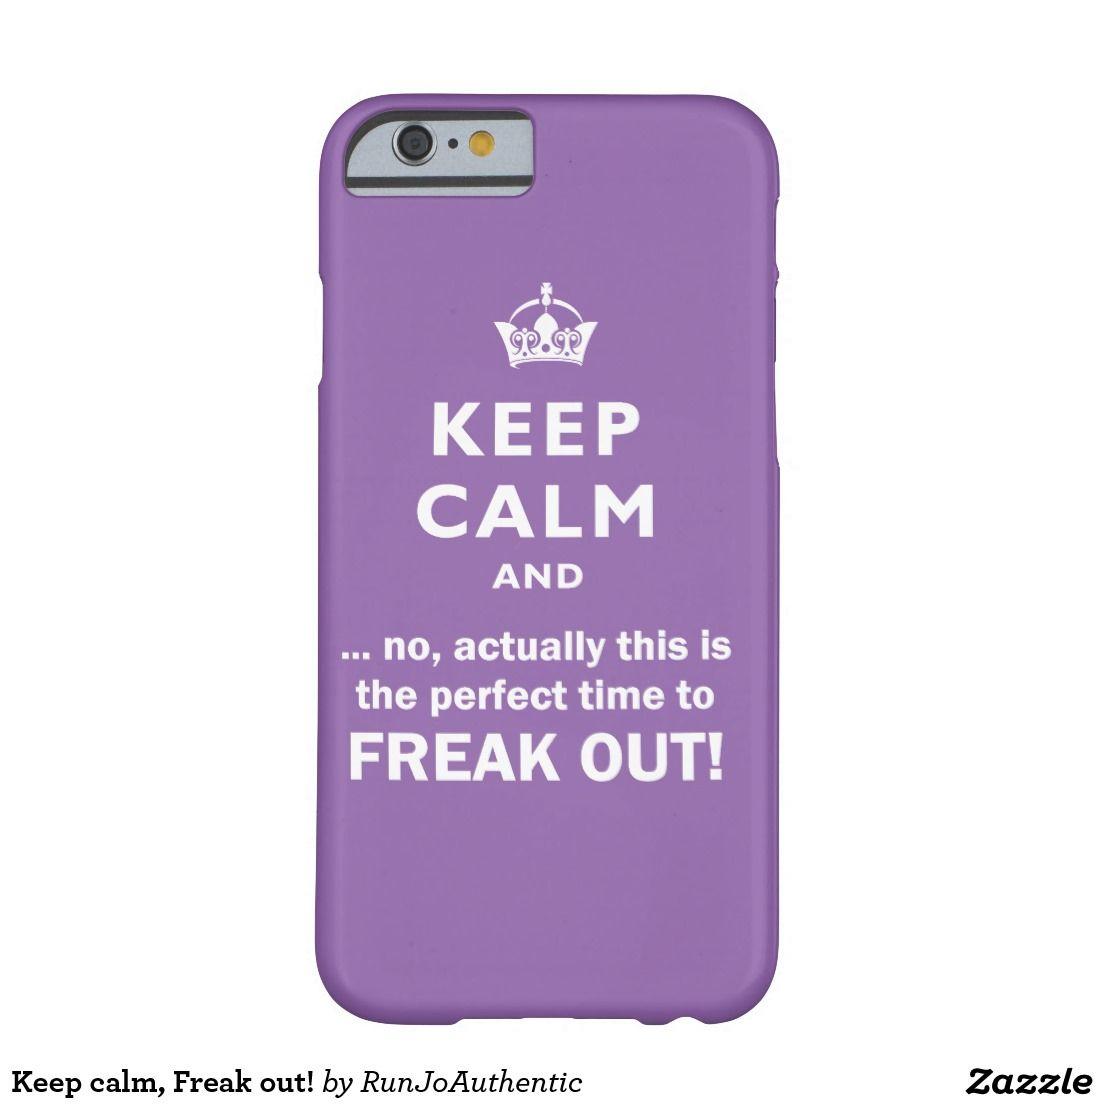 Keep calm, Freak out!